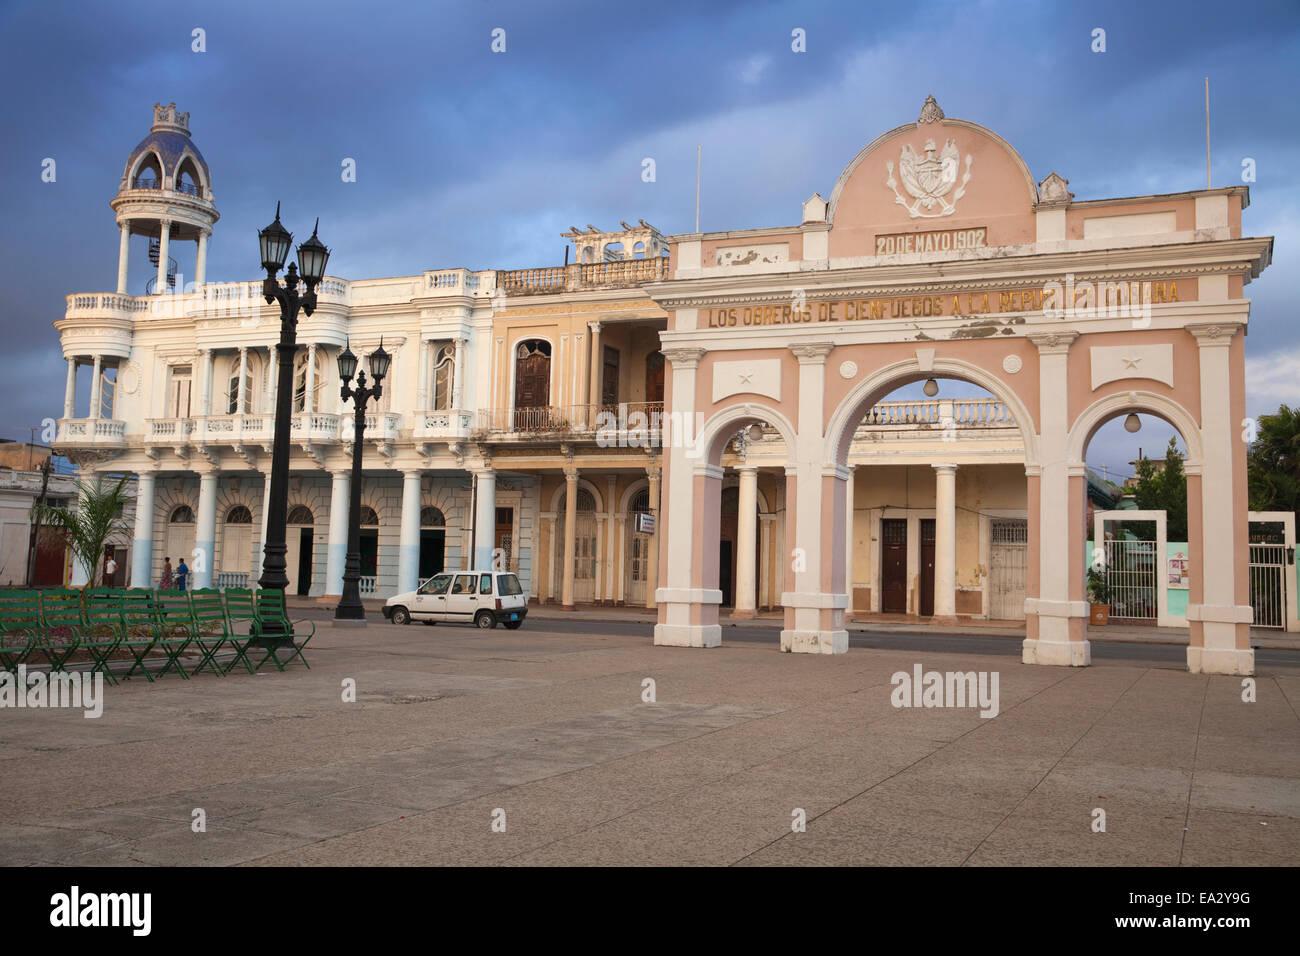 L'arco di Truimph e Casa de la Cultura Beniamino Duarte, ex Palacio de Ferrer, Parque Marta, Cienfuegos, Cuba Immagini Stock